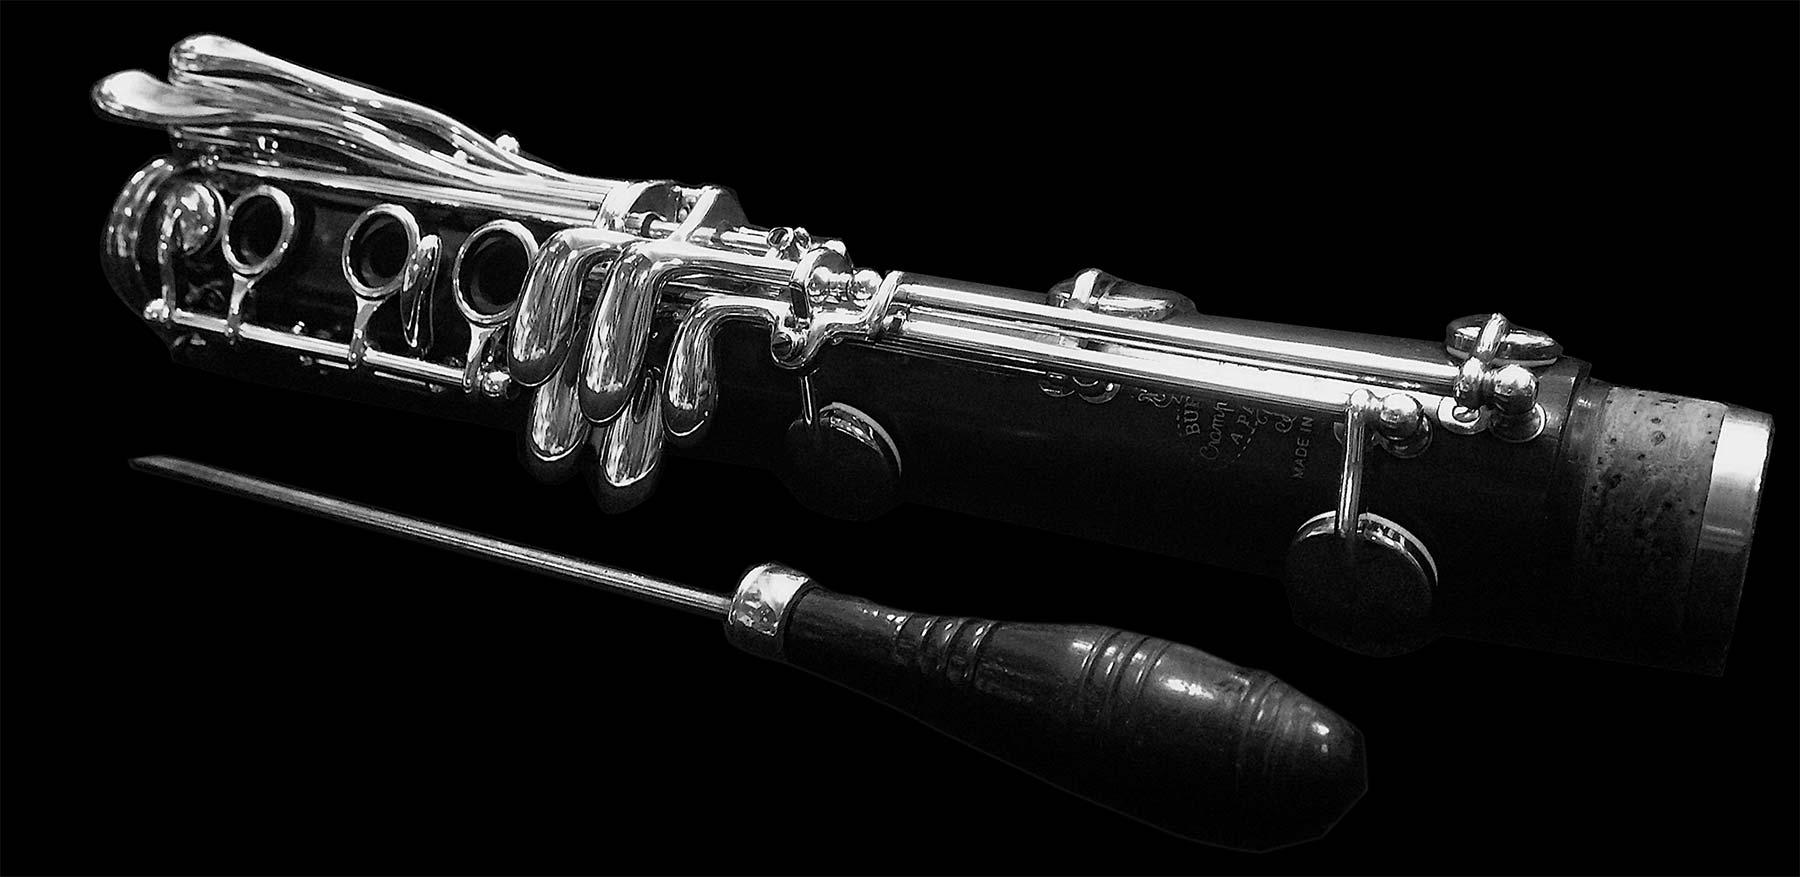 Achat clarinette Buffet Crampon Selmer Yamaha